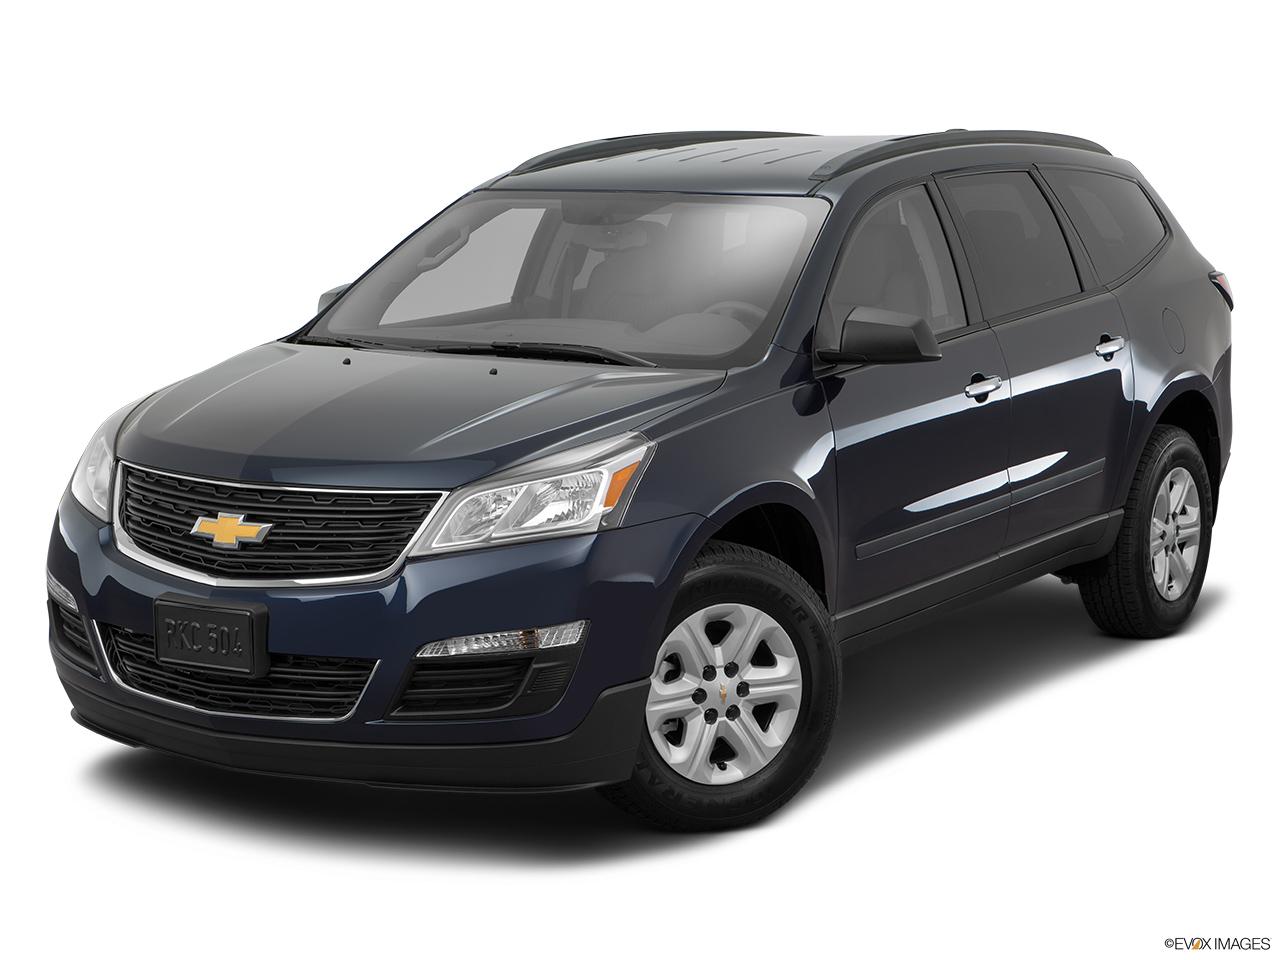 car features list for chevrolet traverse 2016 3 6l ltz uae yallamotor. Black Bedroom Furniture Sets. Home Design Ideas